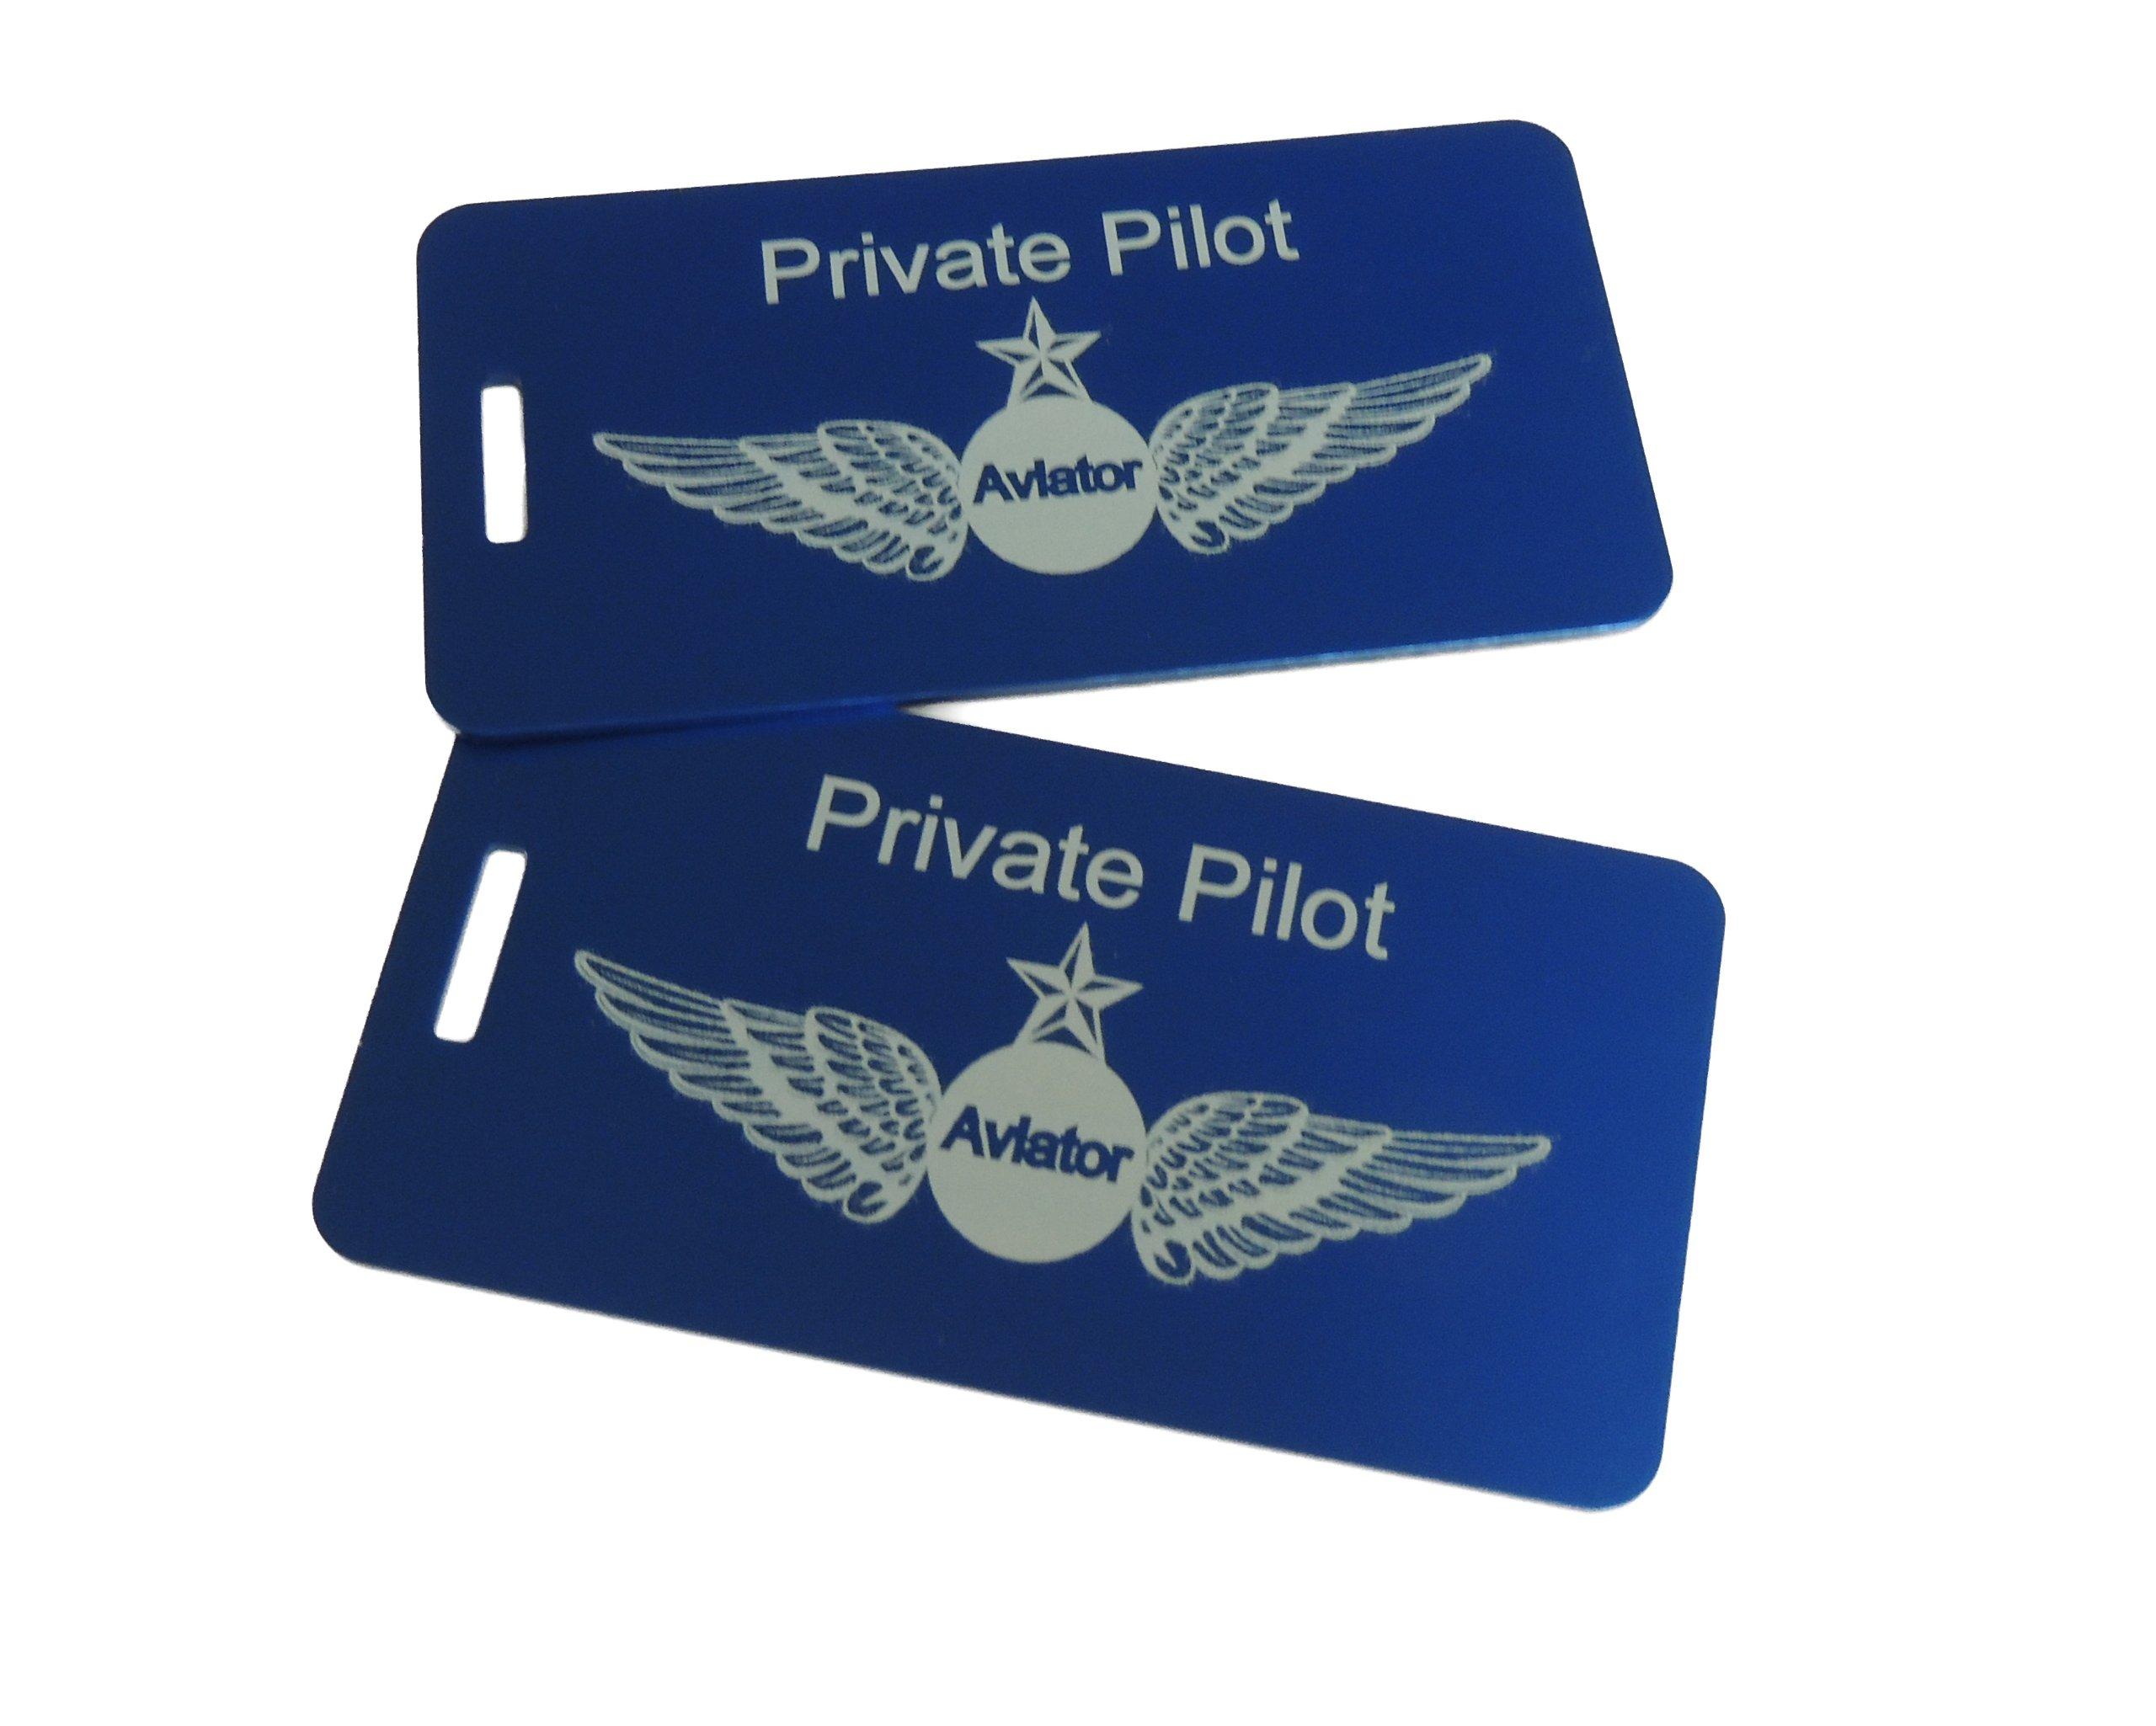 Private Pilot, Pilot Luggage, Pilot Luggage Tags, Pilot Headset Bag Tag, Private Pilot Rating, (Blue)